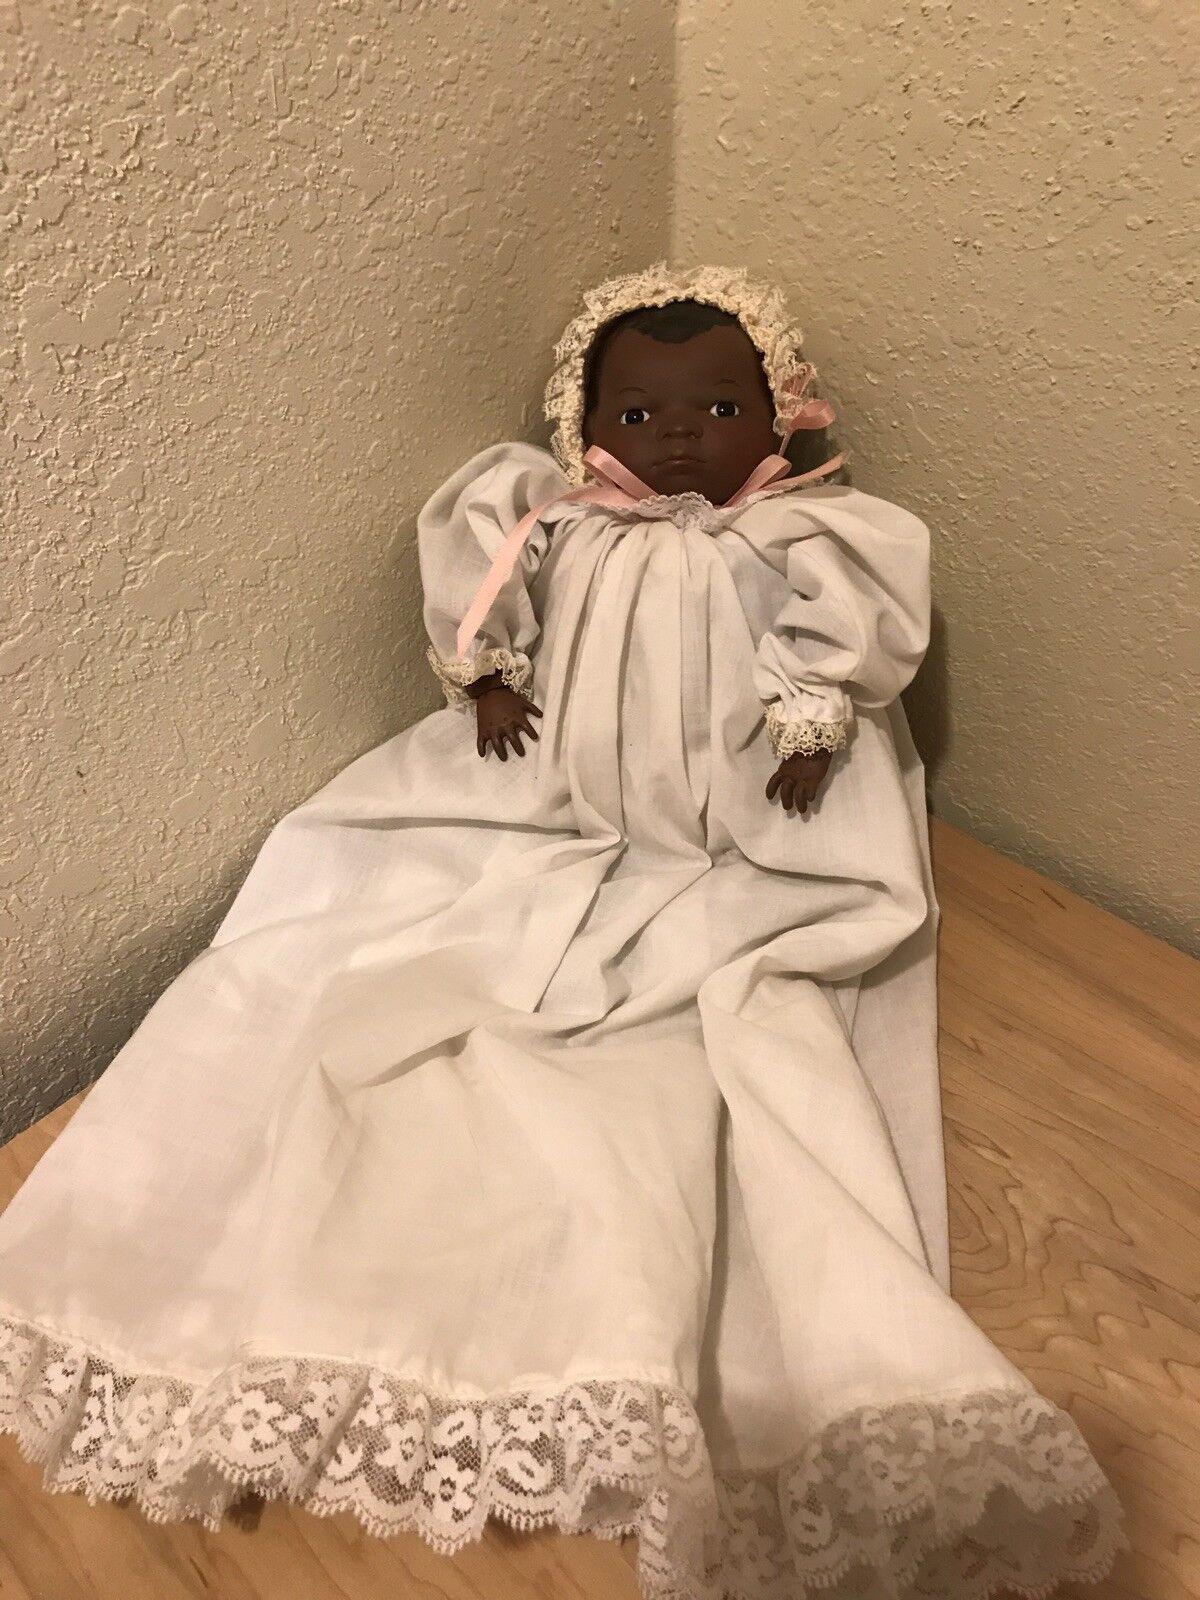 Grace S Putnam Vintage Rana Cuerpo African American Baby Doll-Alemania